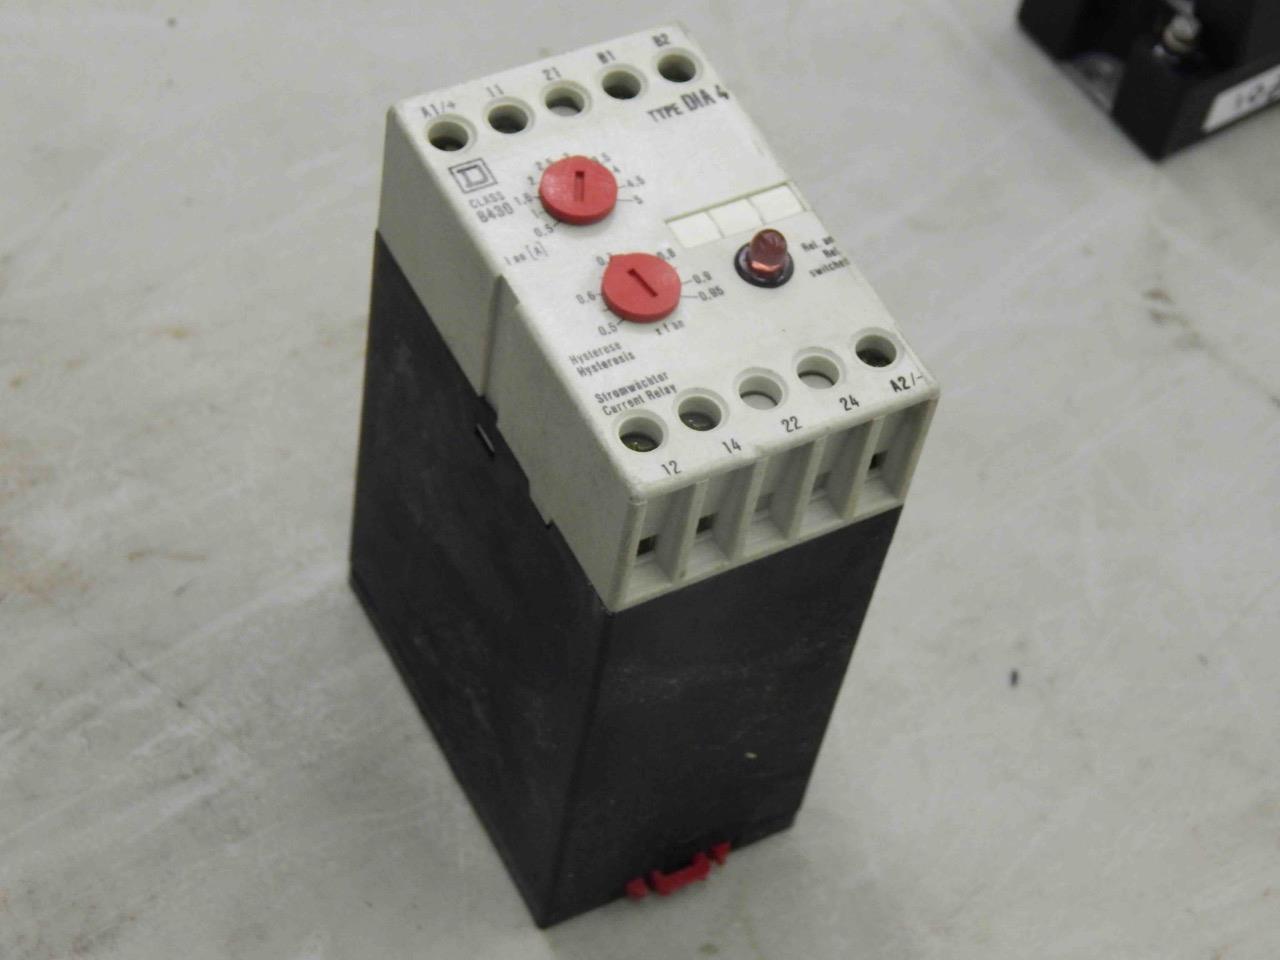 1020 Square D 8430-DIA4 Stromwaechter Current Control Relay 0.5-5A ...